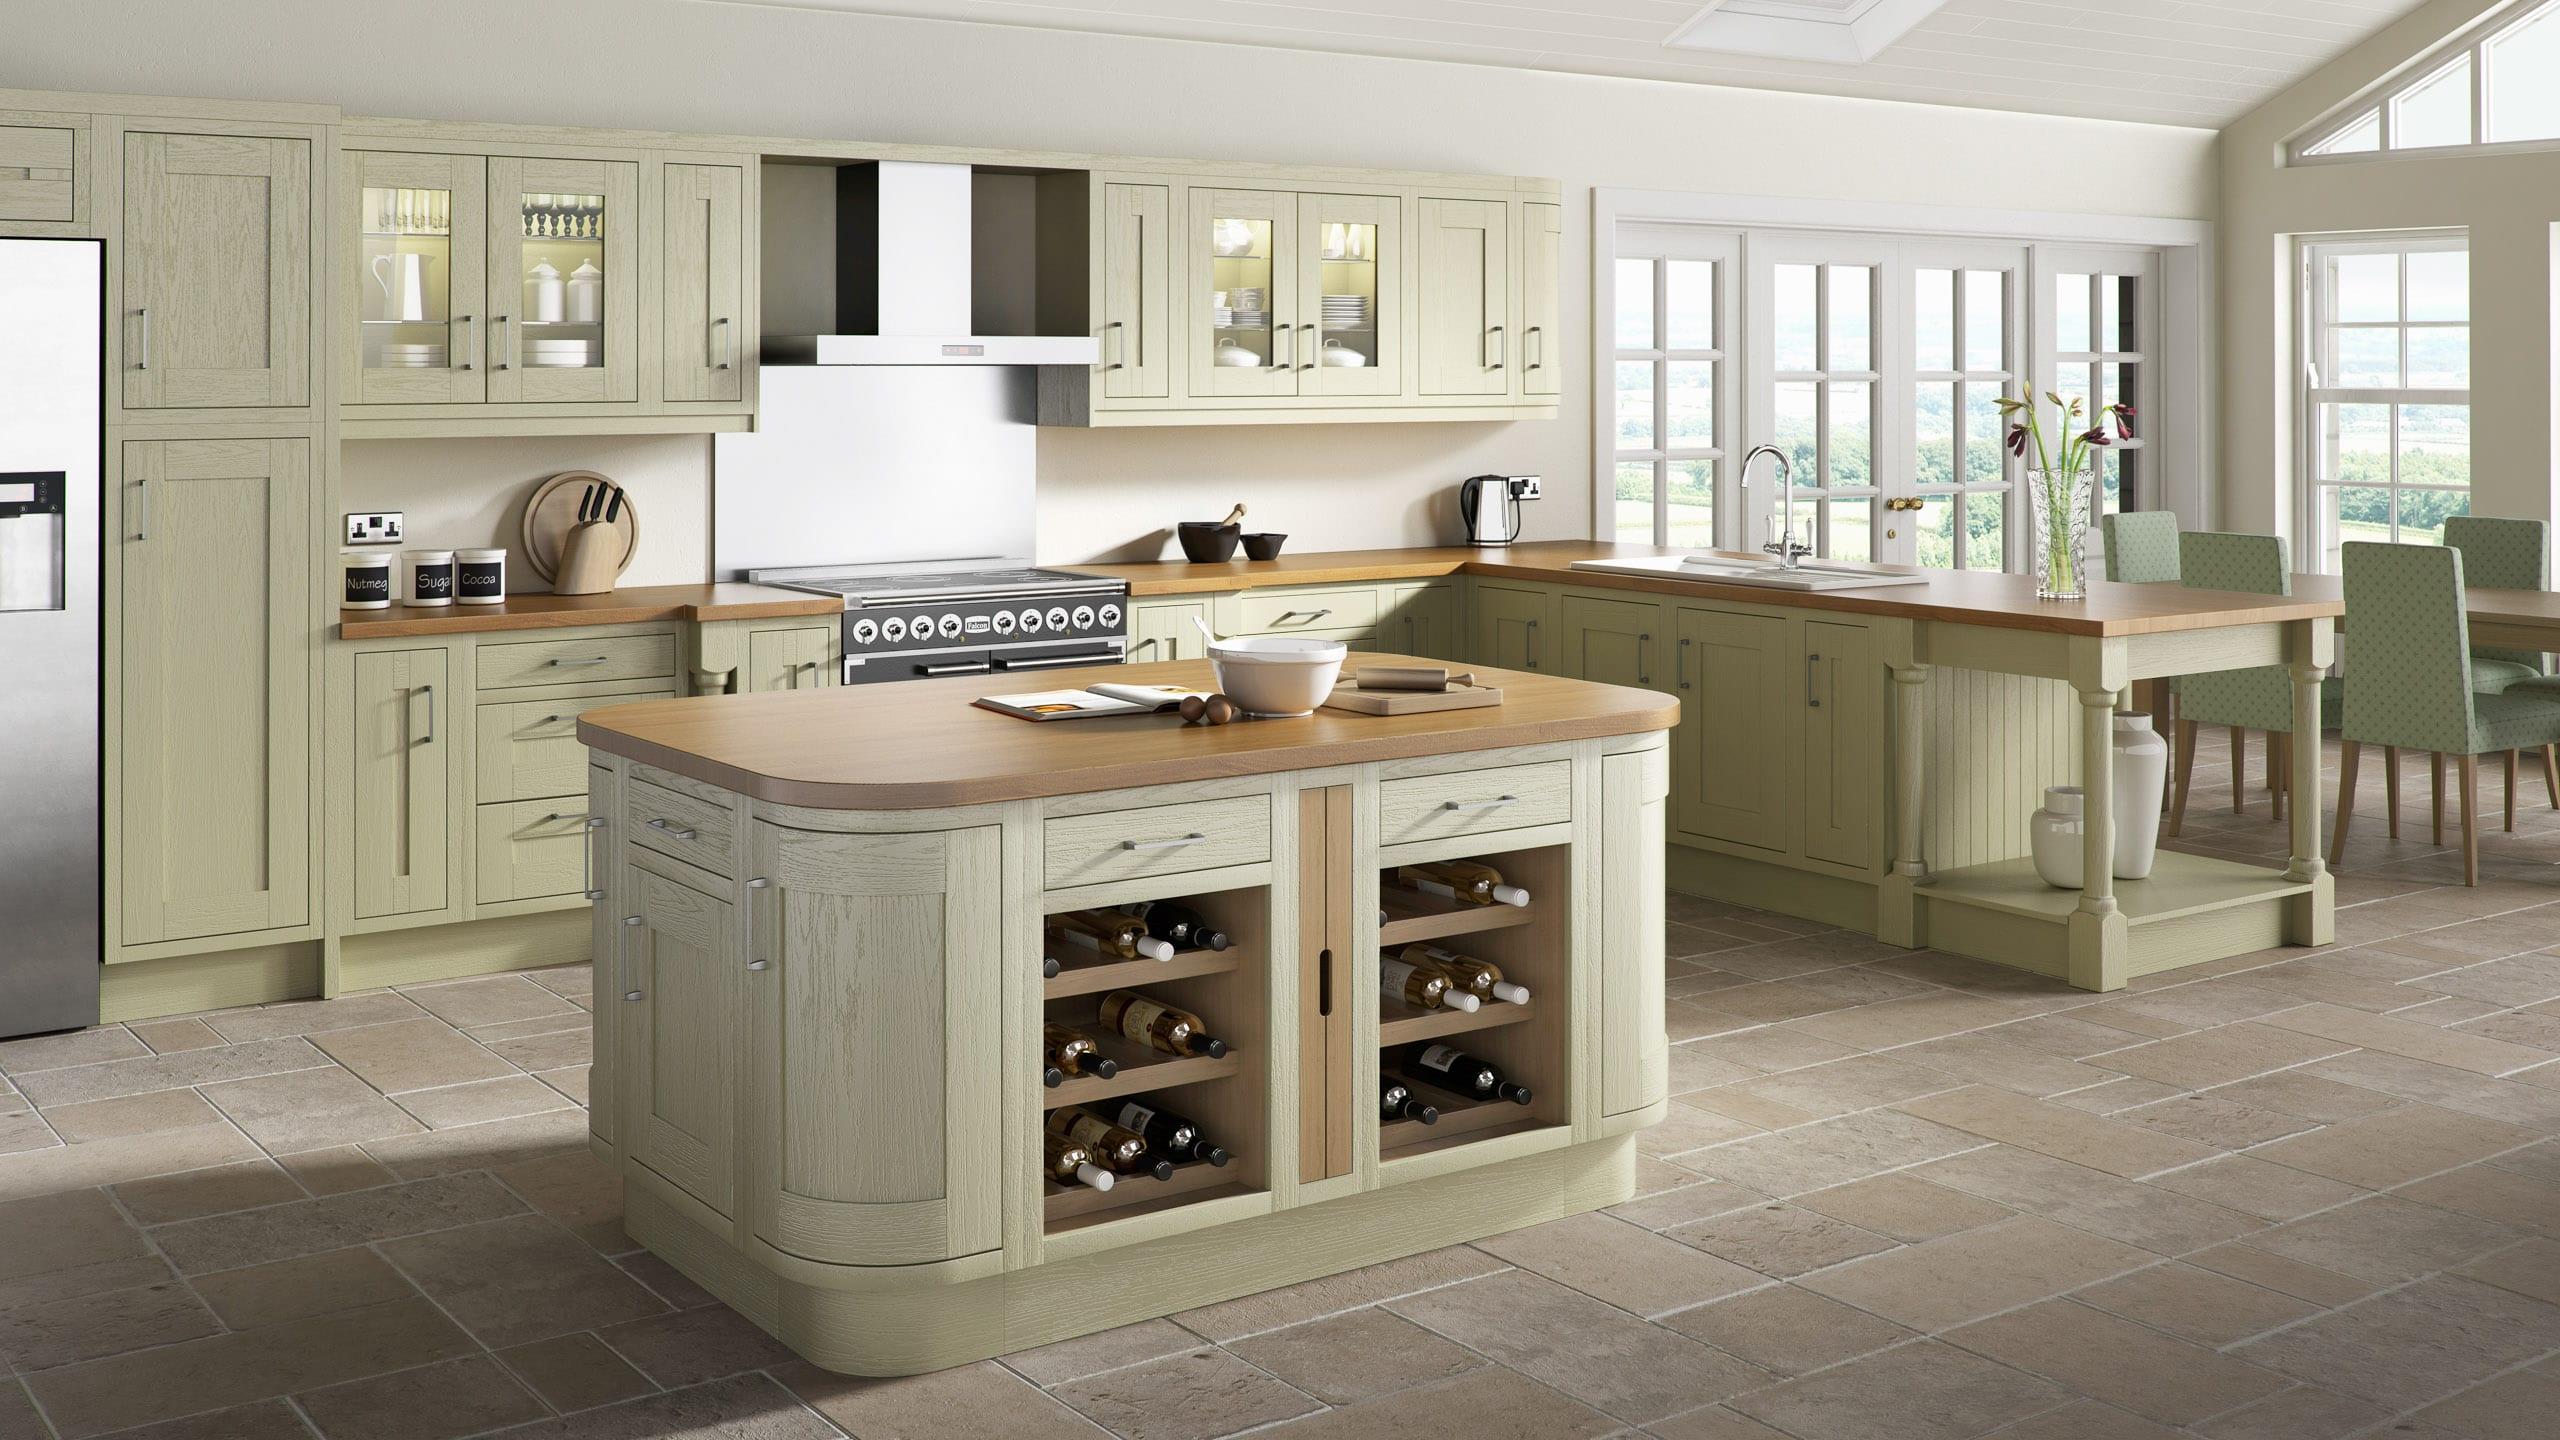 Wood Framed Painted Green - kitchen design